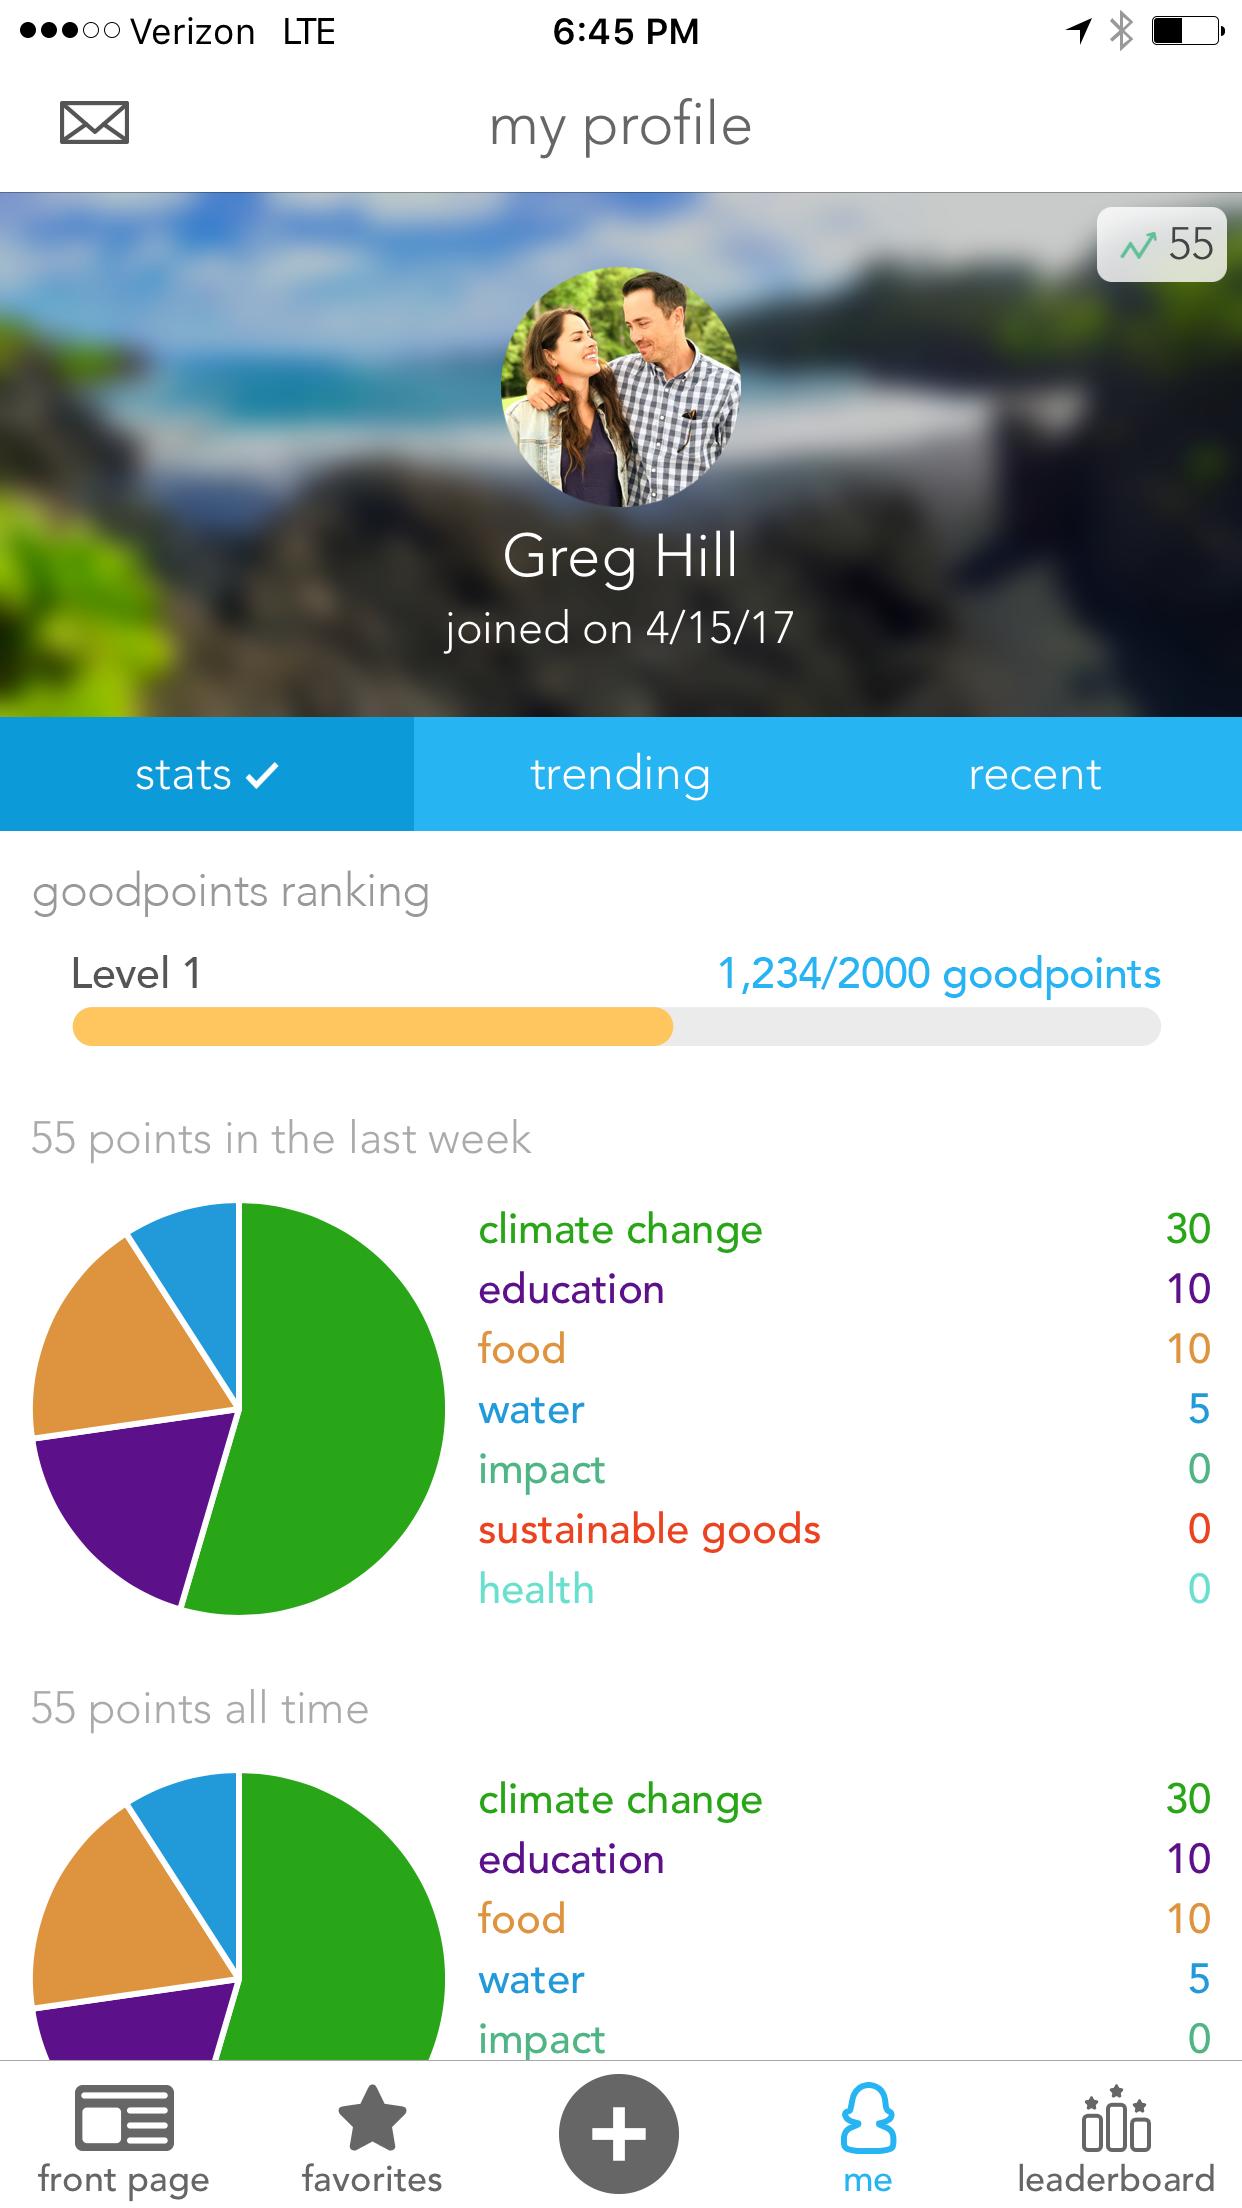 A screenshot of the final Profile screen